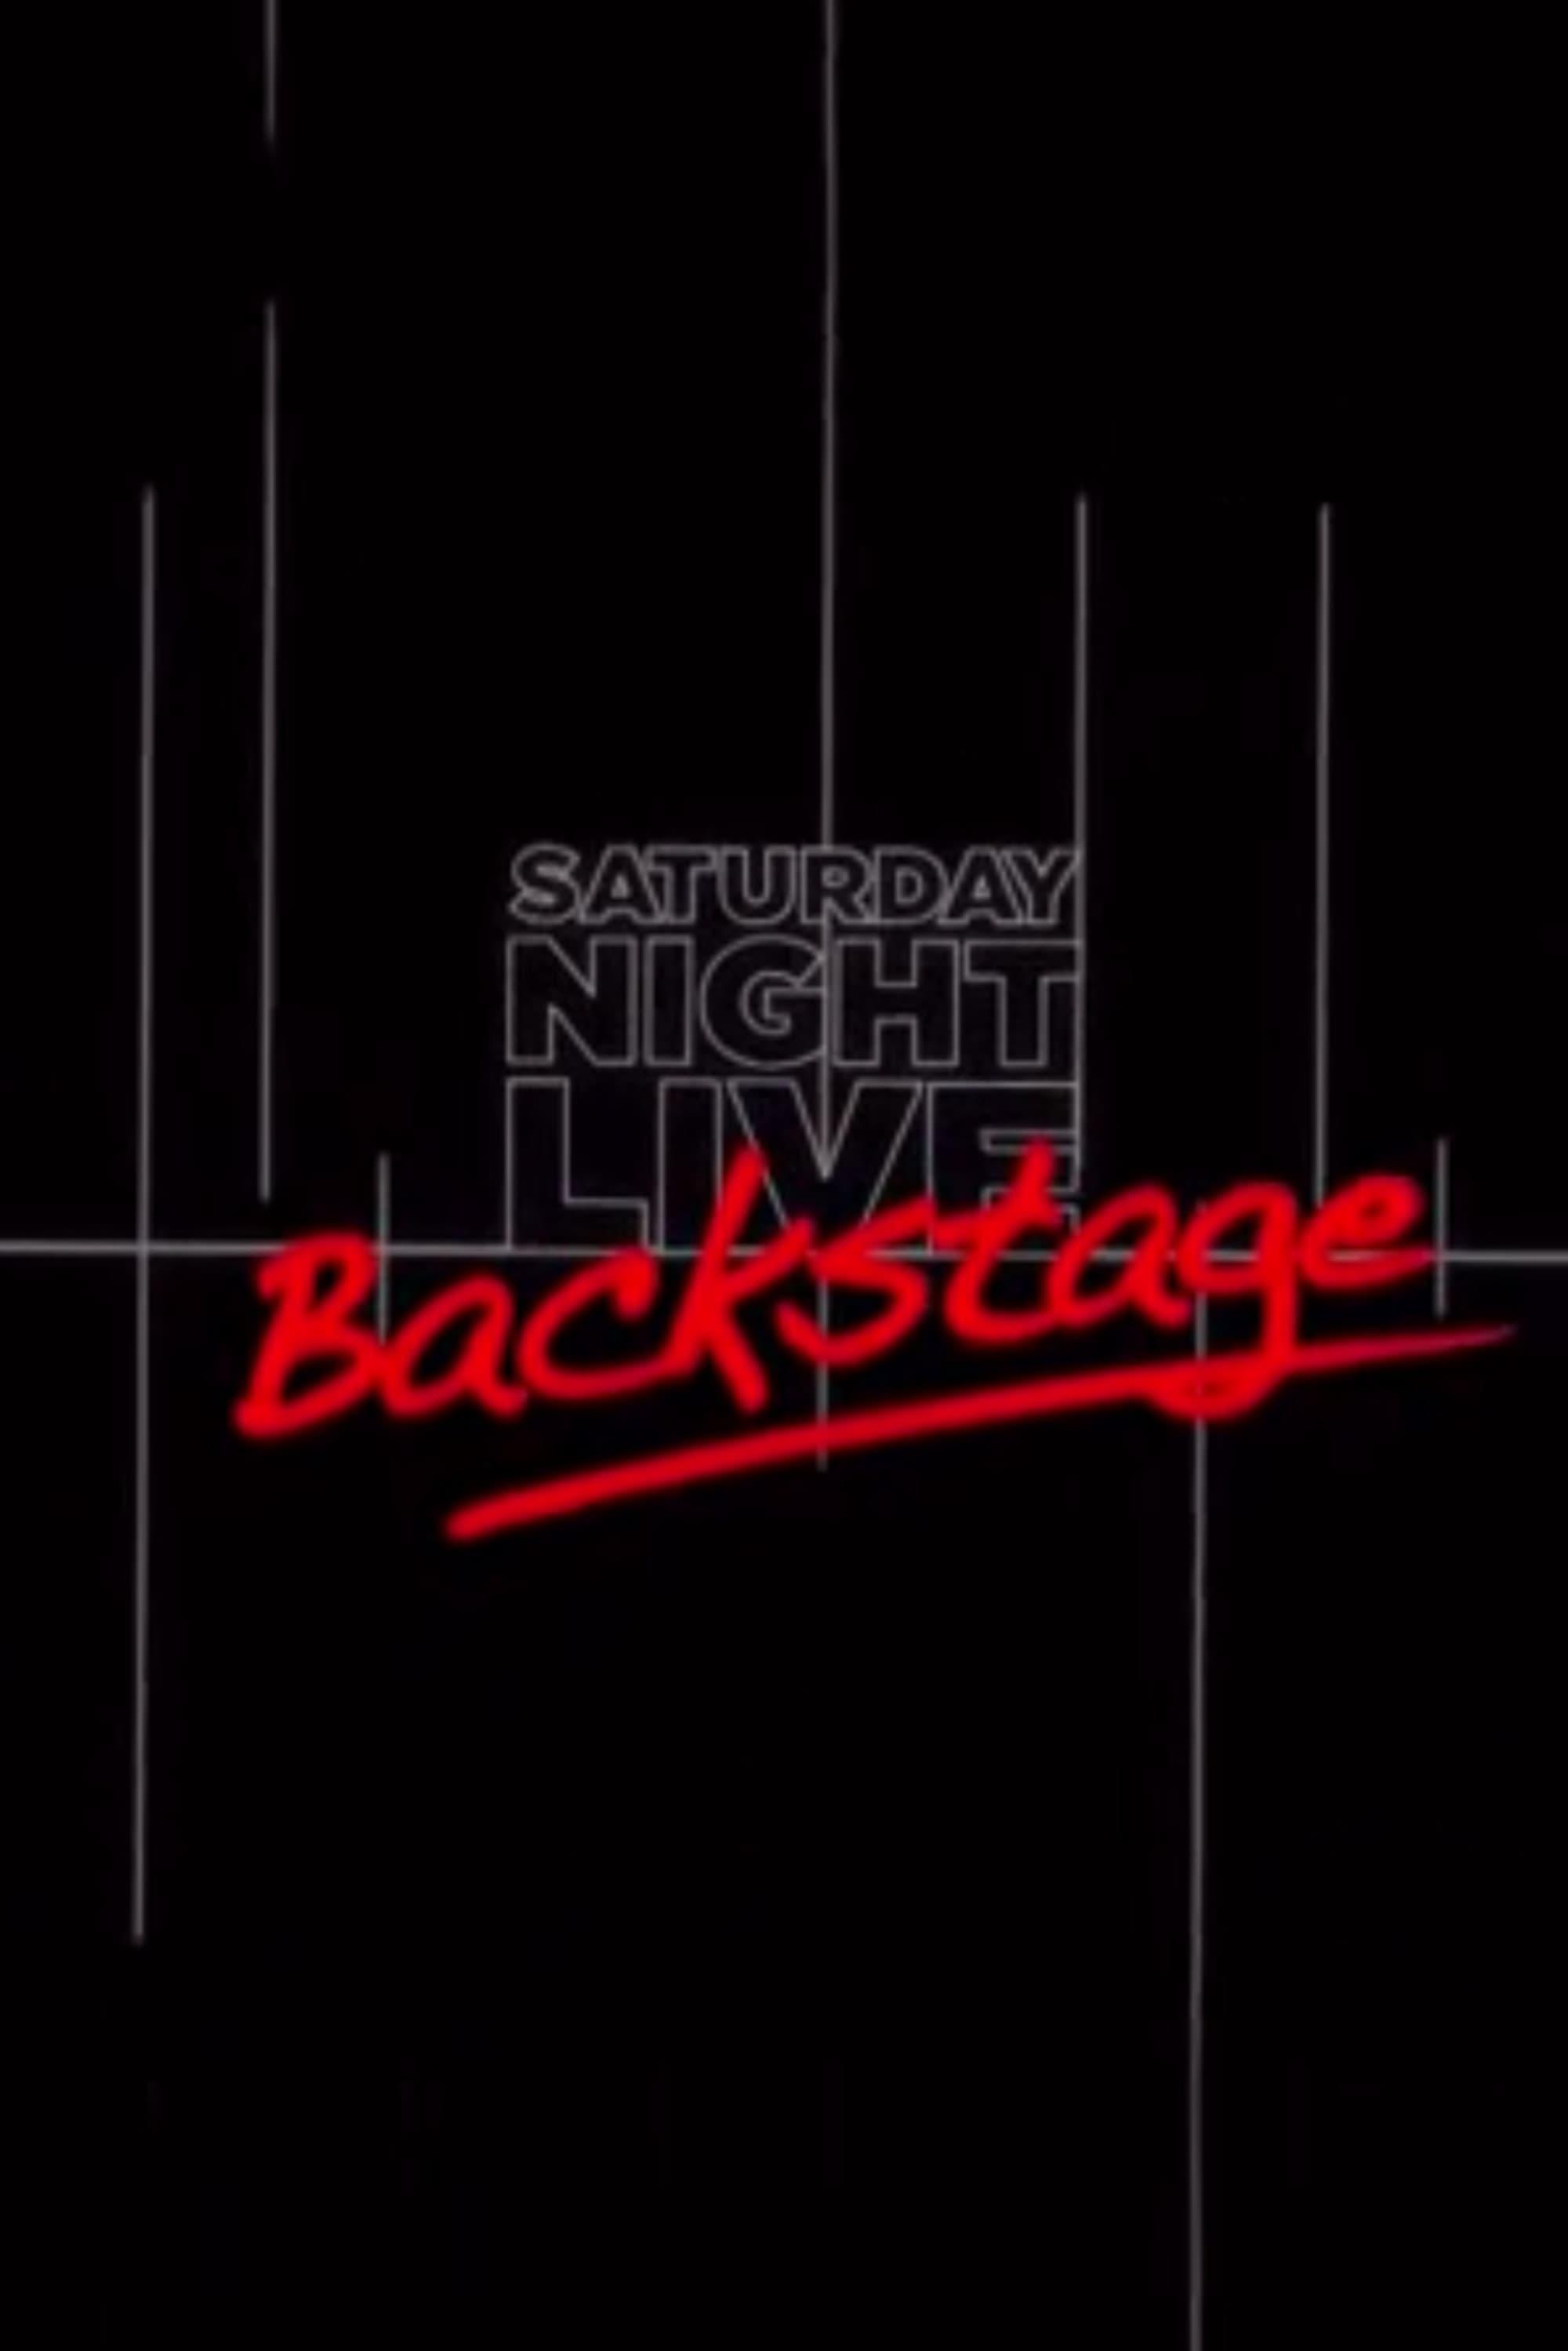 Saturday Night Live Backstage